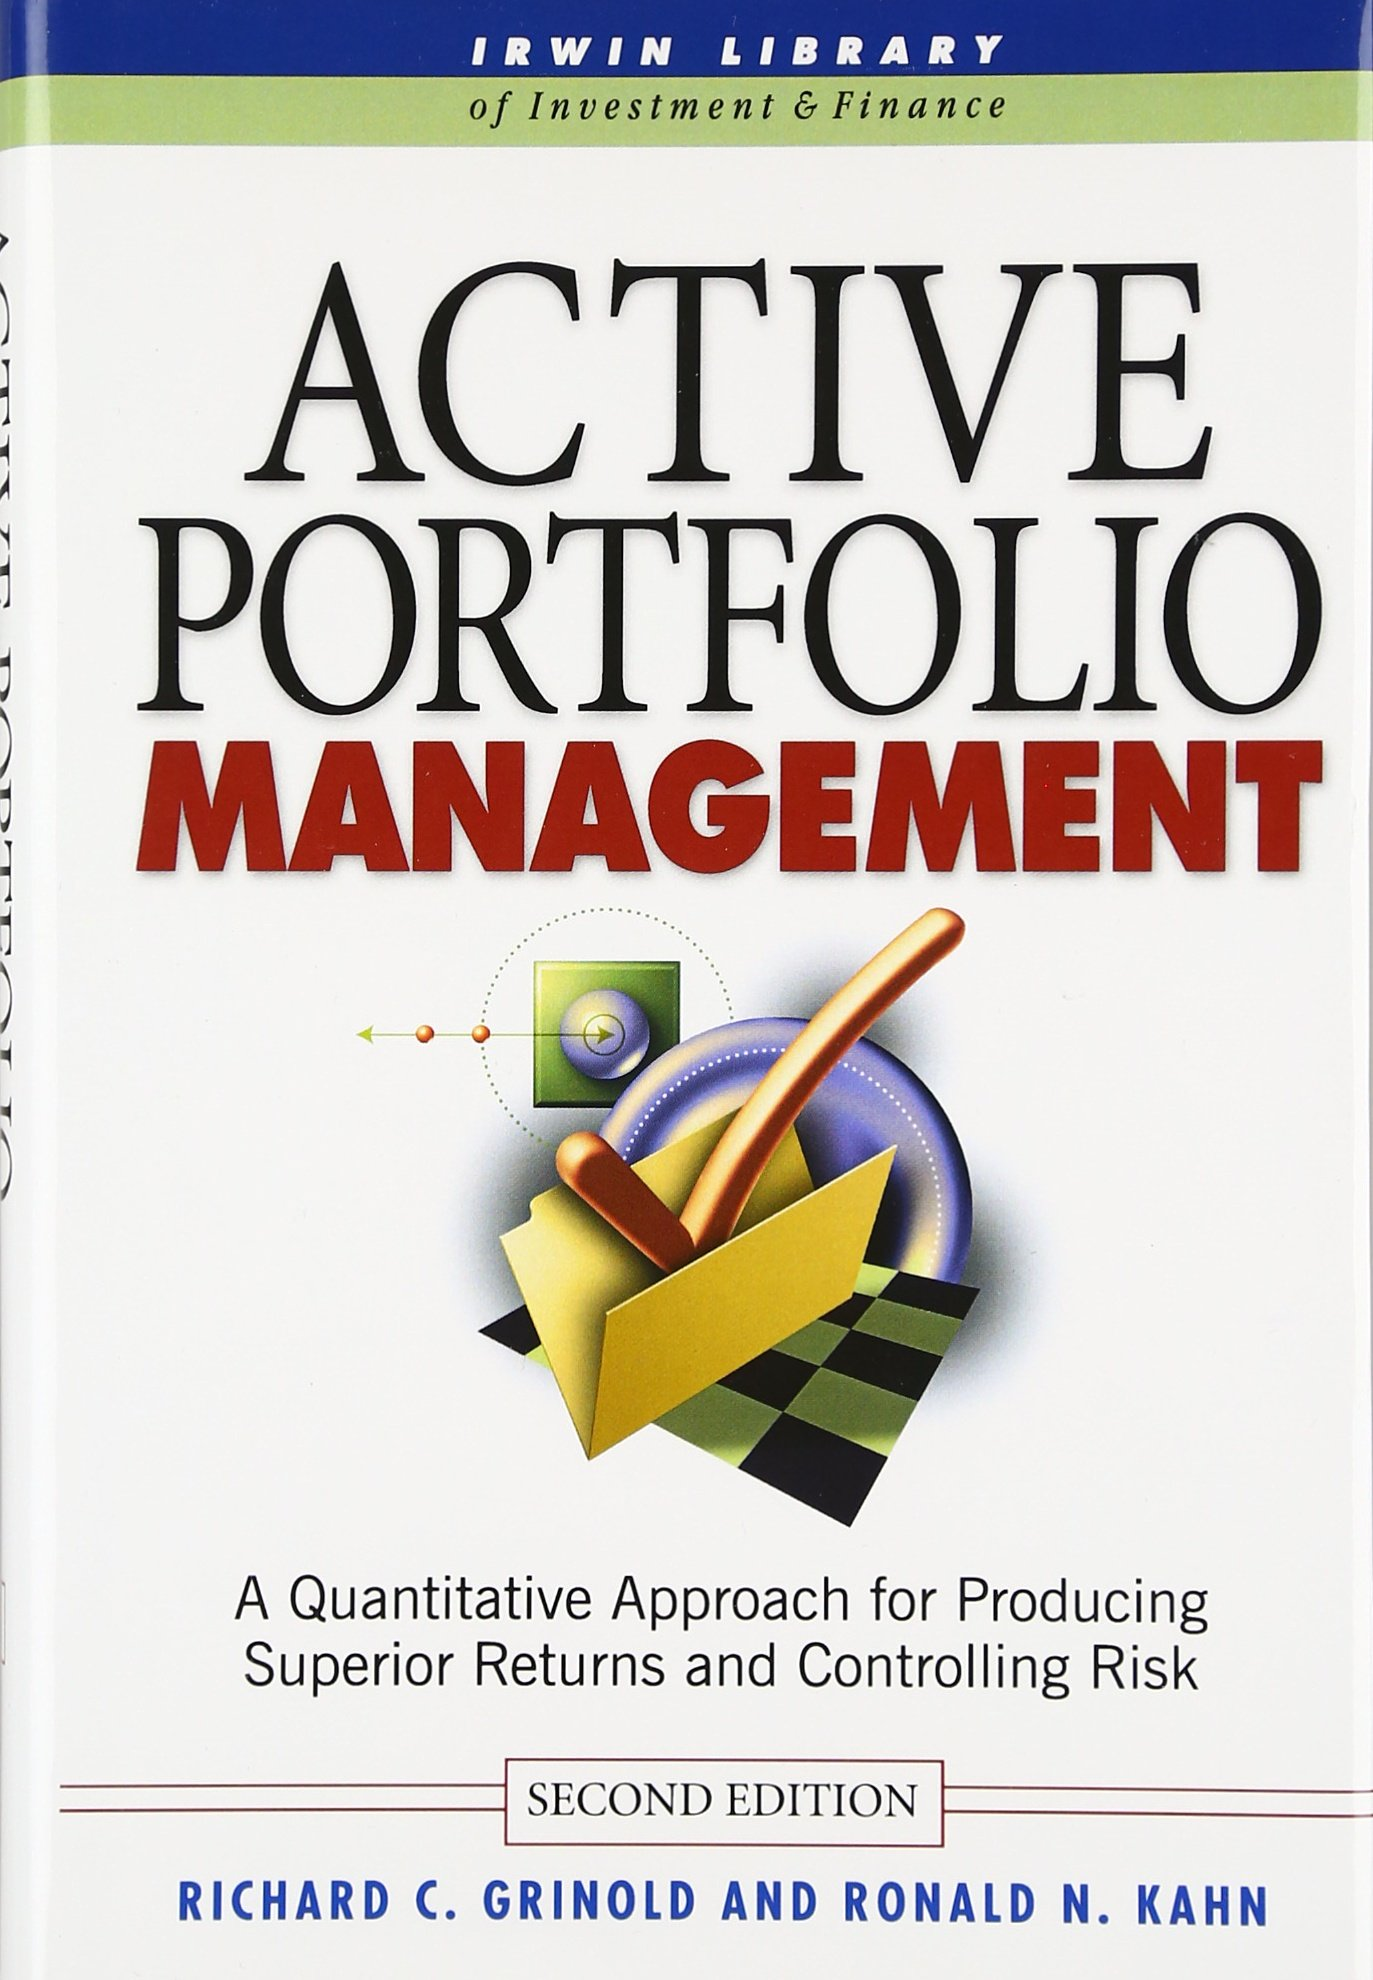 Active Portfolio Management: A Quantitative Approach for Producing Superior Returns and Controlling Risk